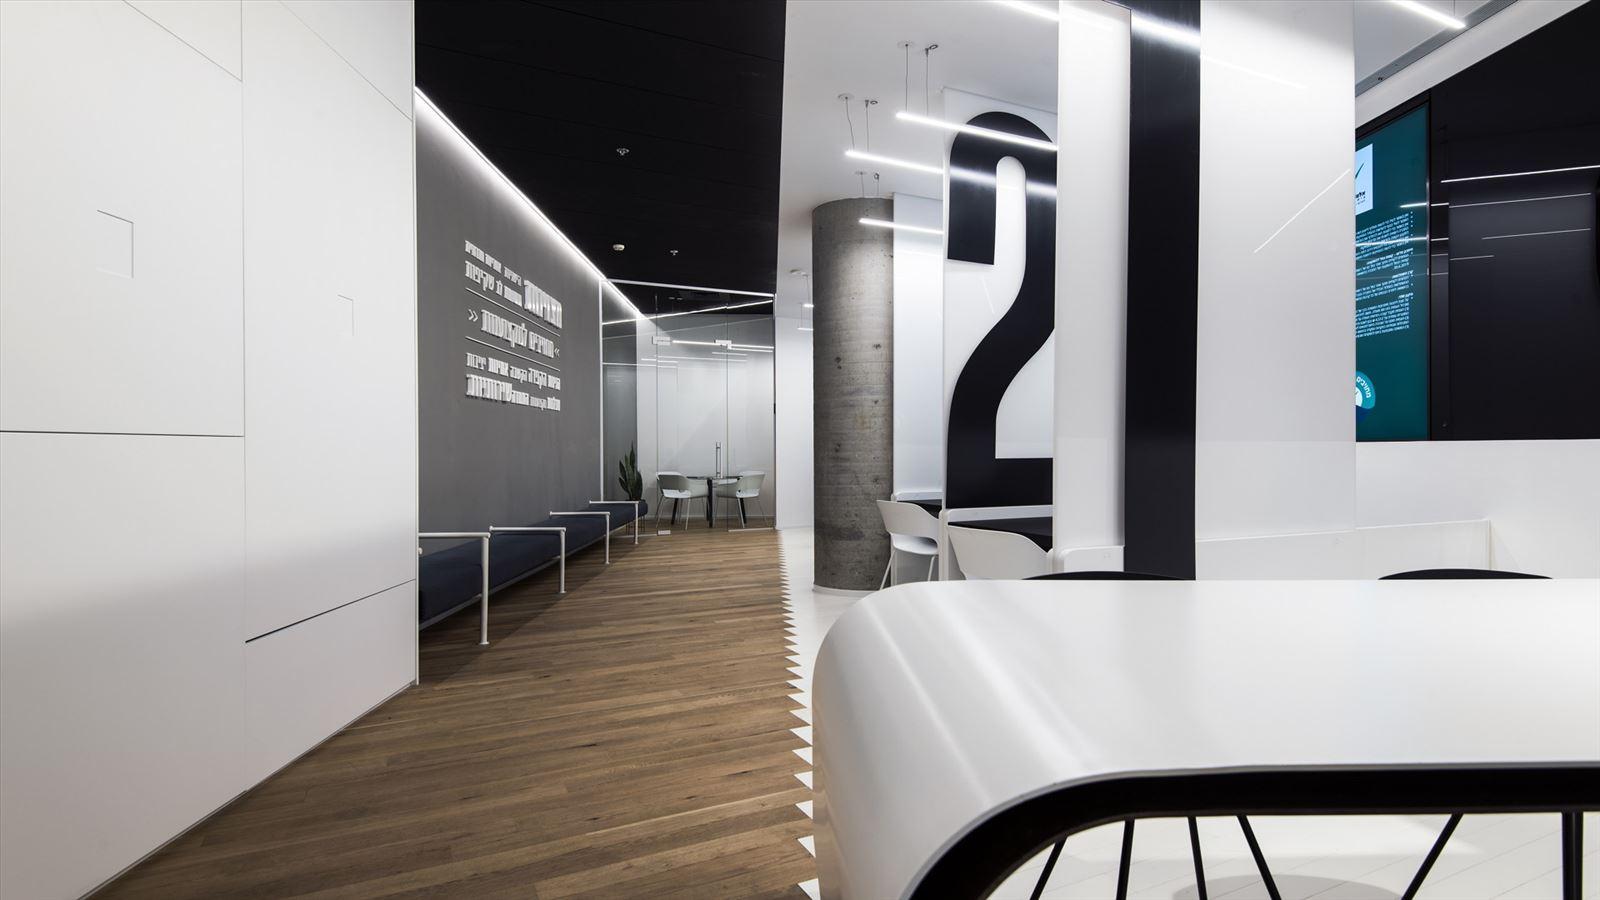 Office lighting project כל גופי התאורה במשרד על ידי קמחי תאורה - תאורה אדריכלית